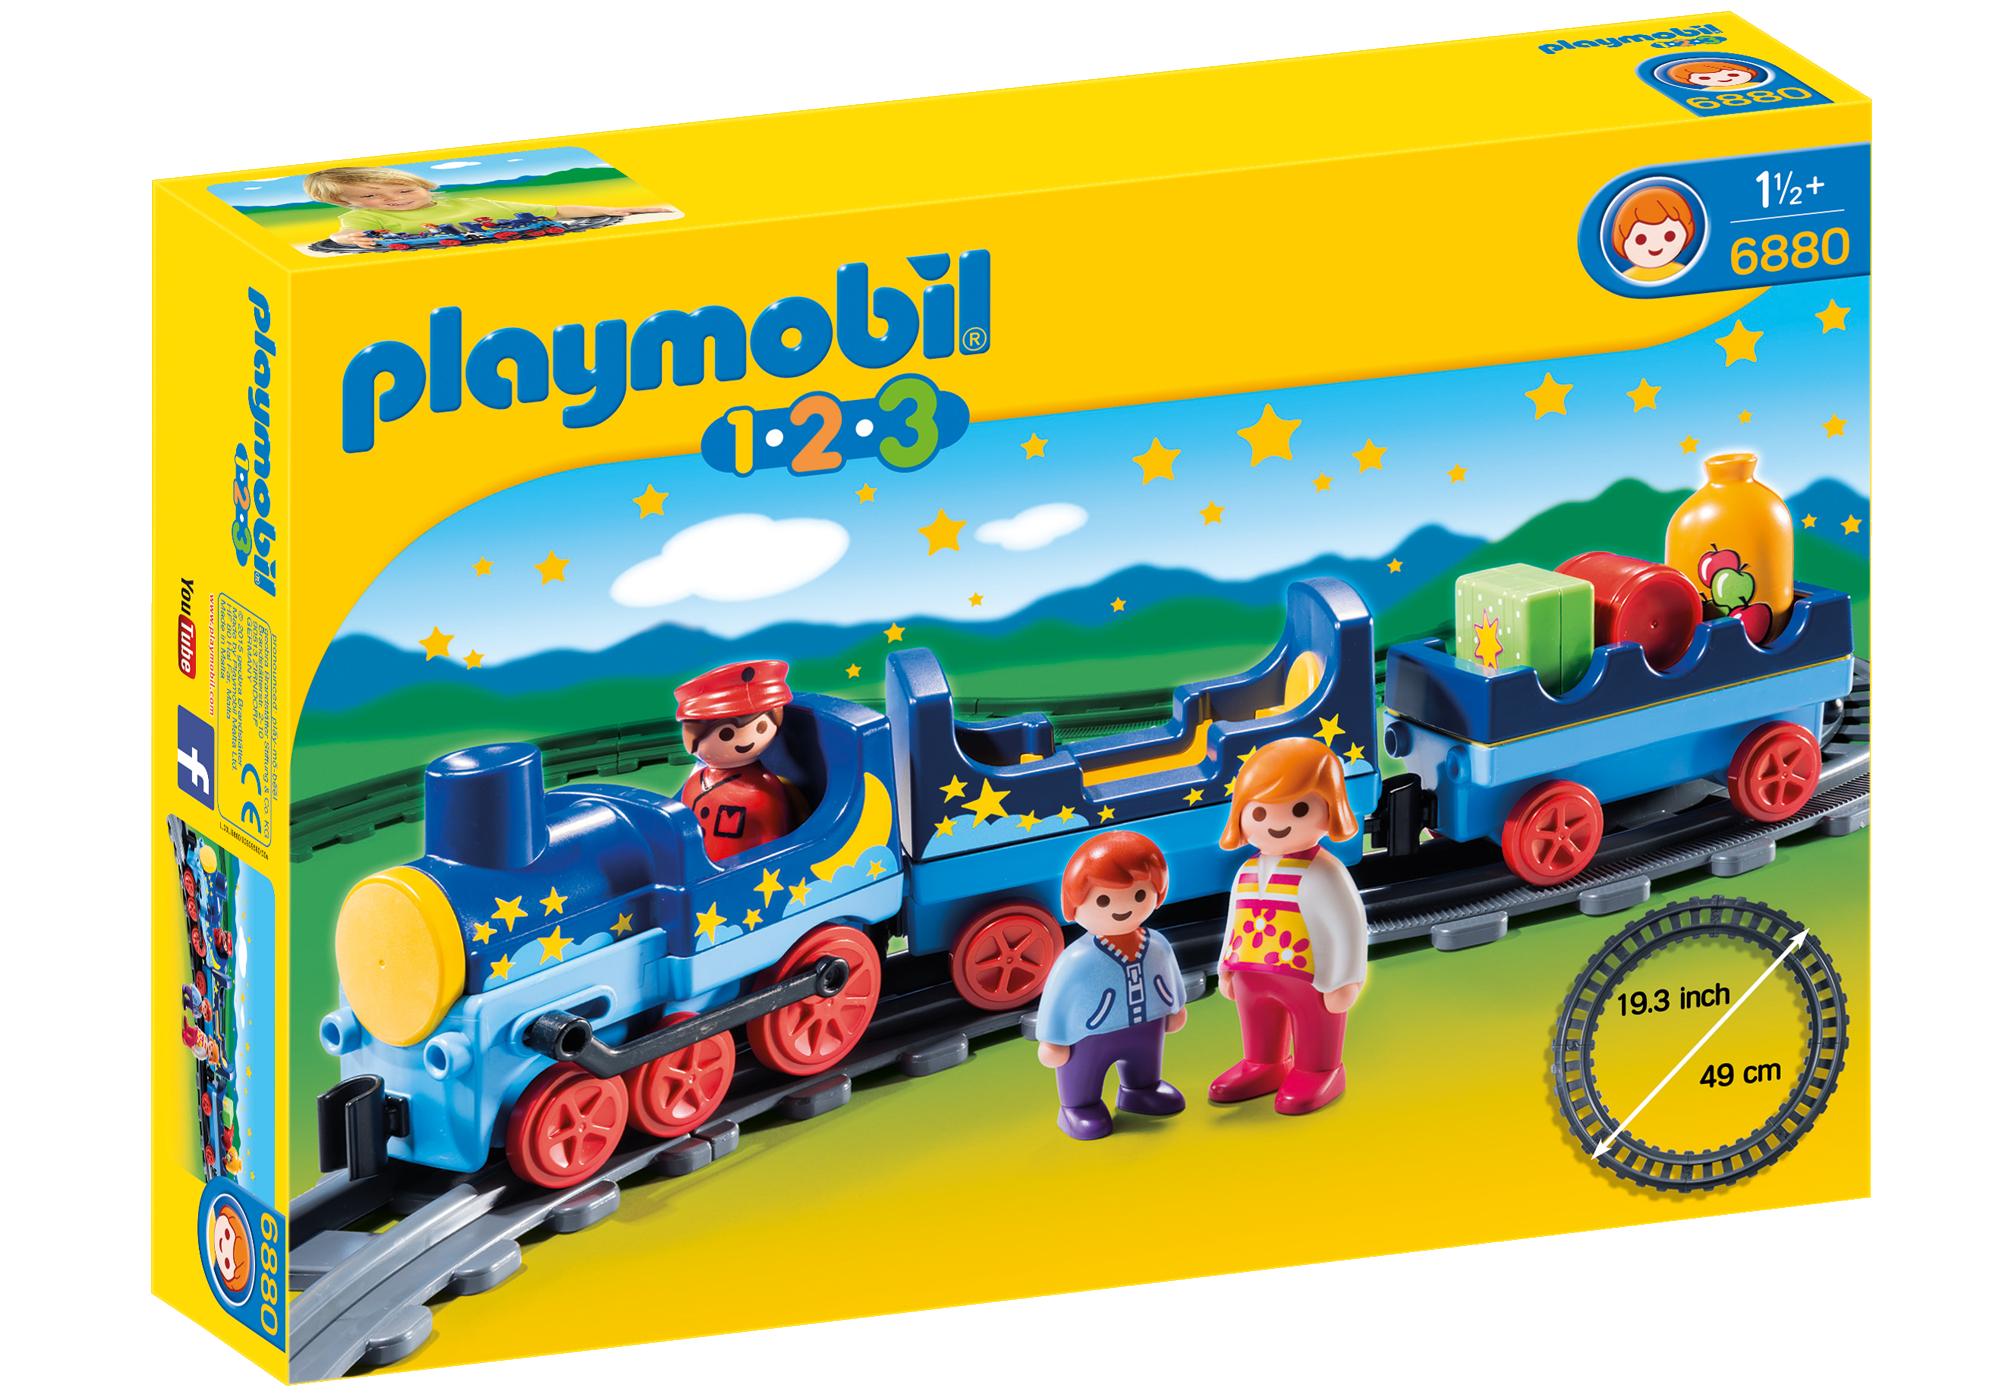 http://media.playmobil.com/i/playmobil/6880_product_box_front/1.2.3 Tren con Vías